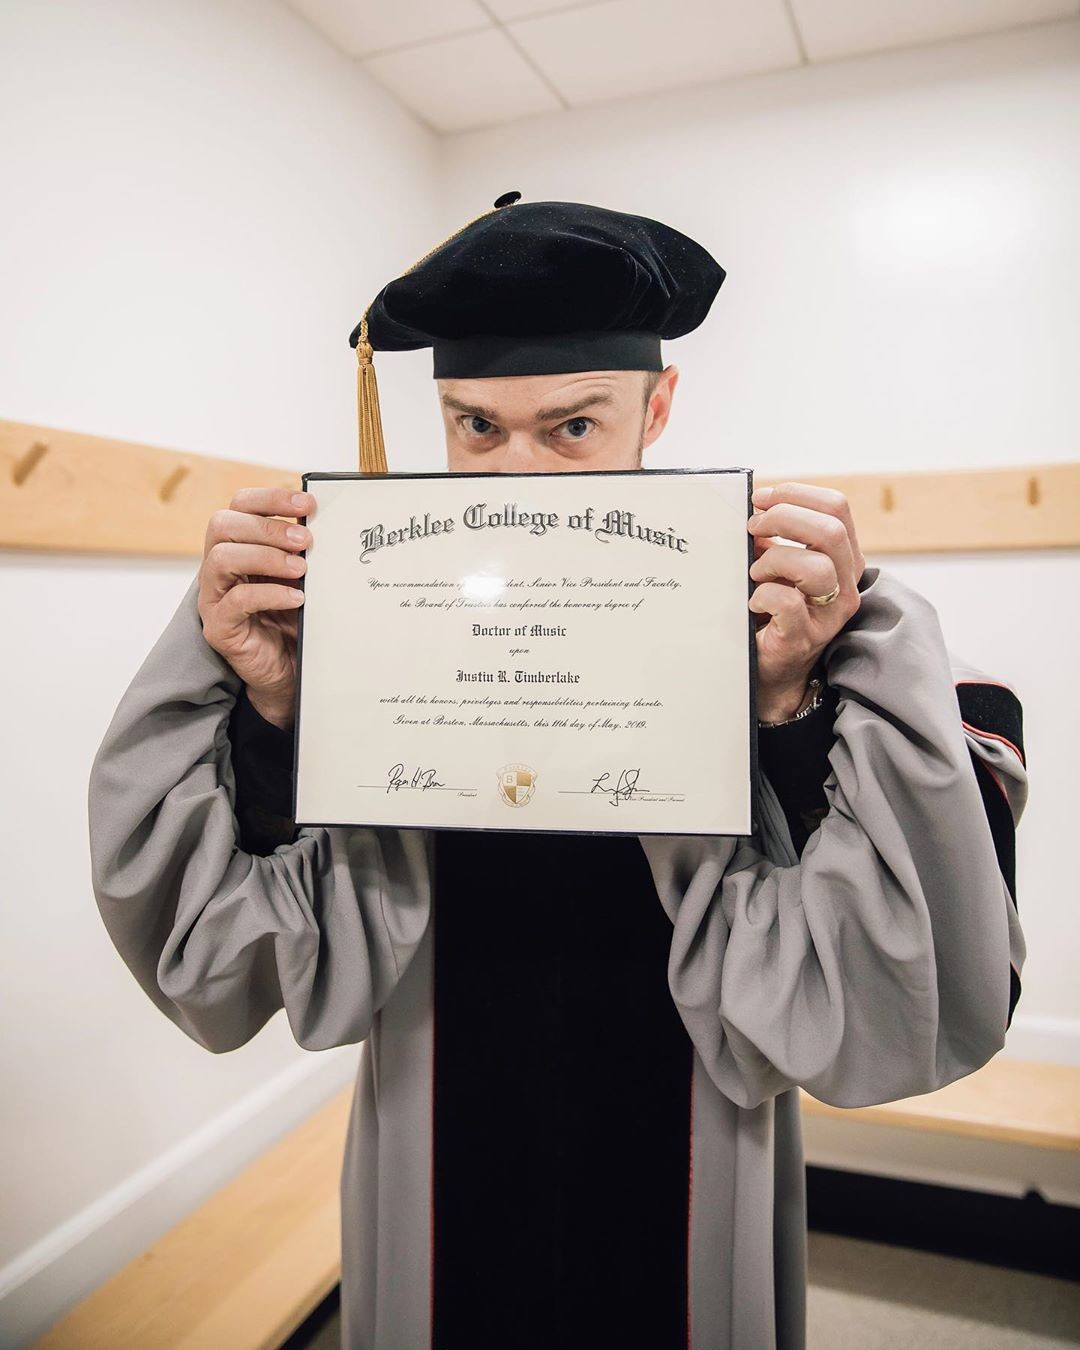 Джастин Тимберлейк получил докторскую степень по музыке